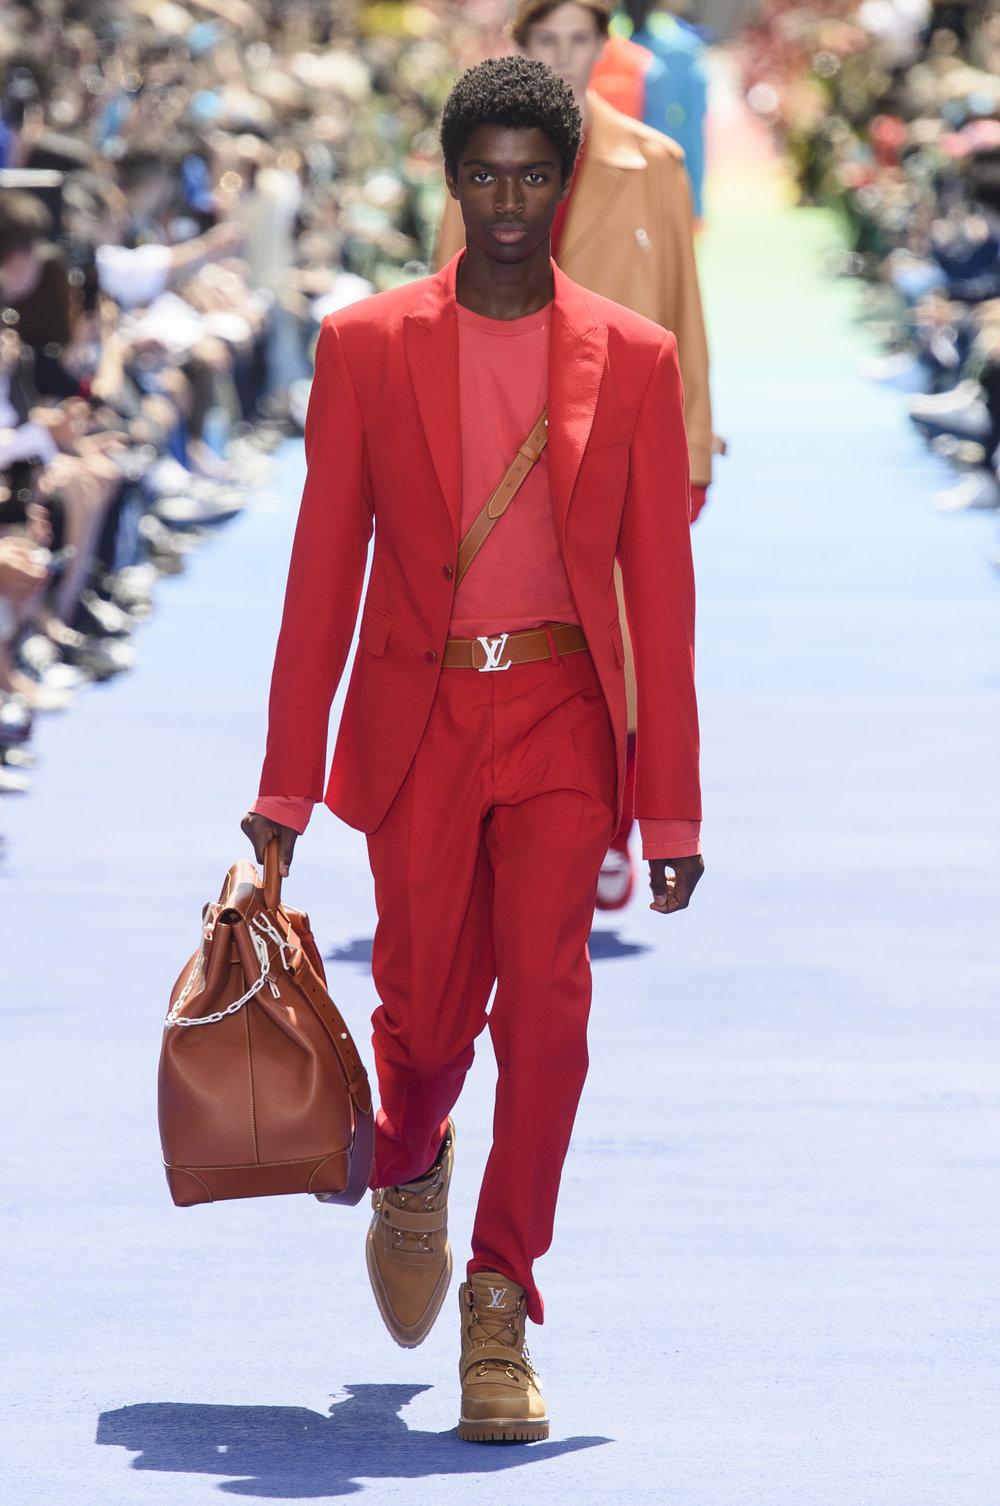 36_Louis_Vuitton_original_vui_prs_ss19_109.jpg